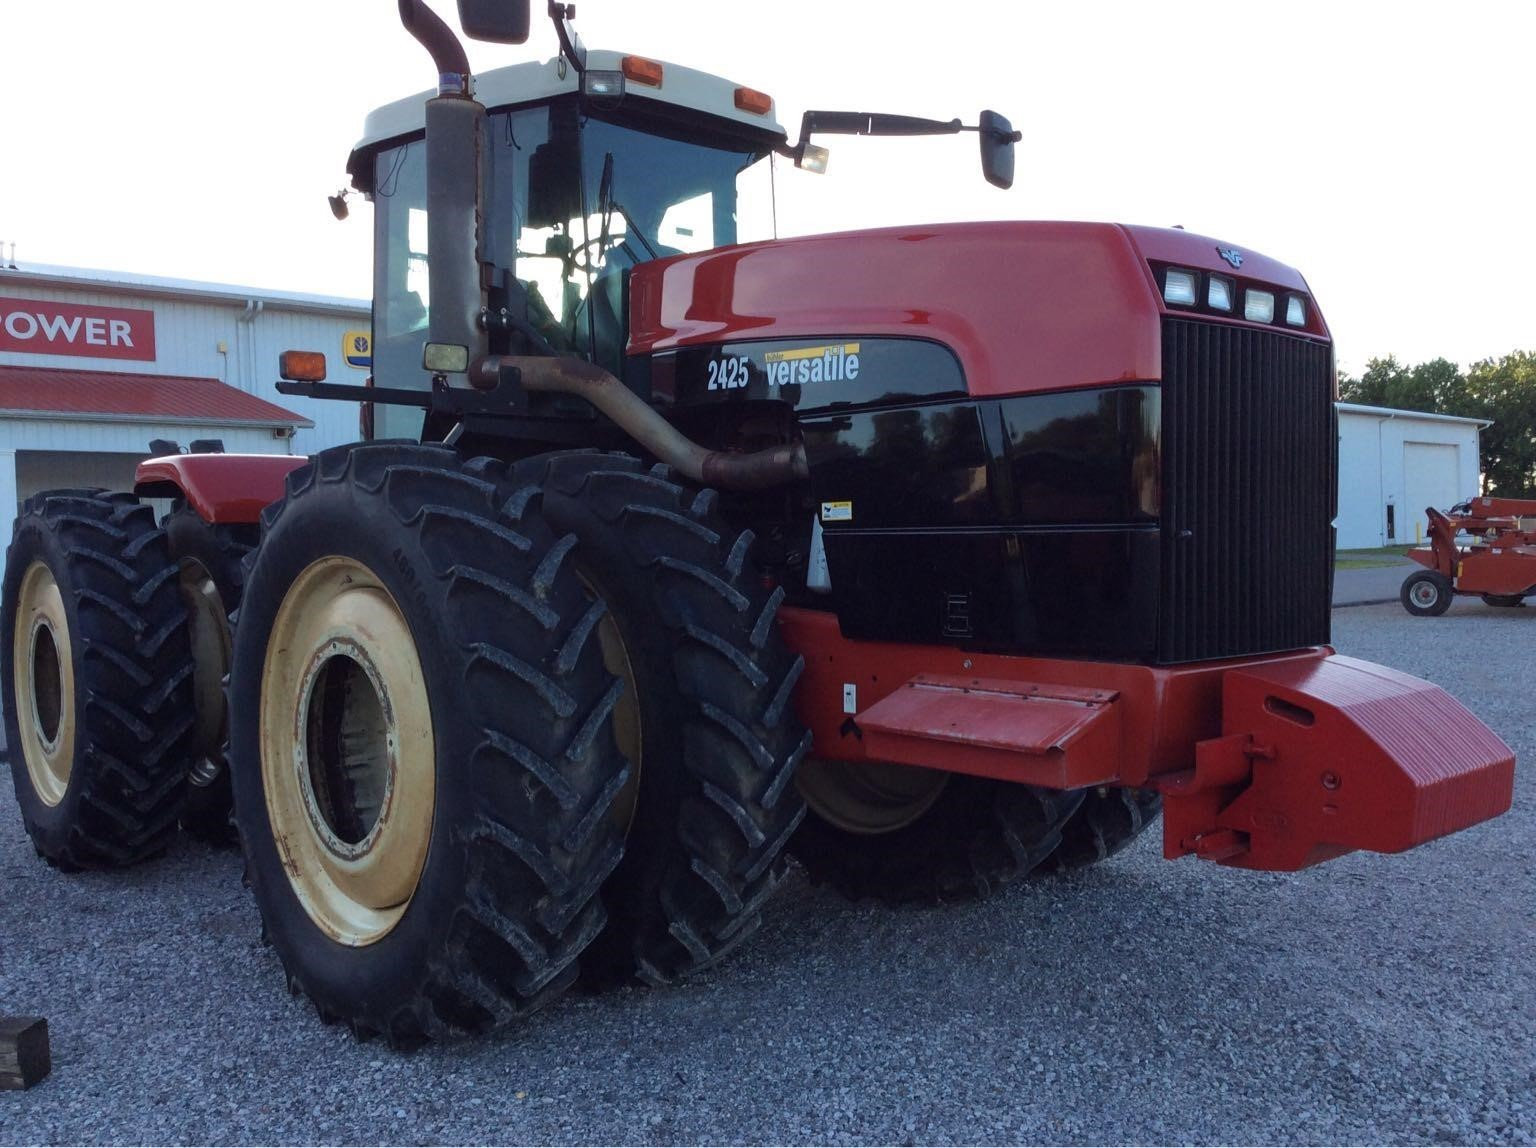 2005 Buhler Versatile 2425 Tractor